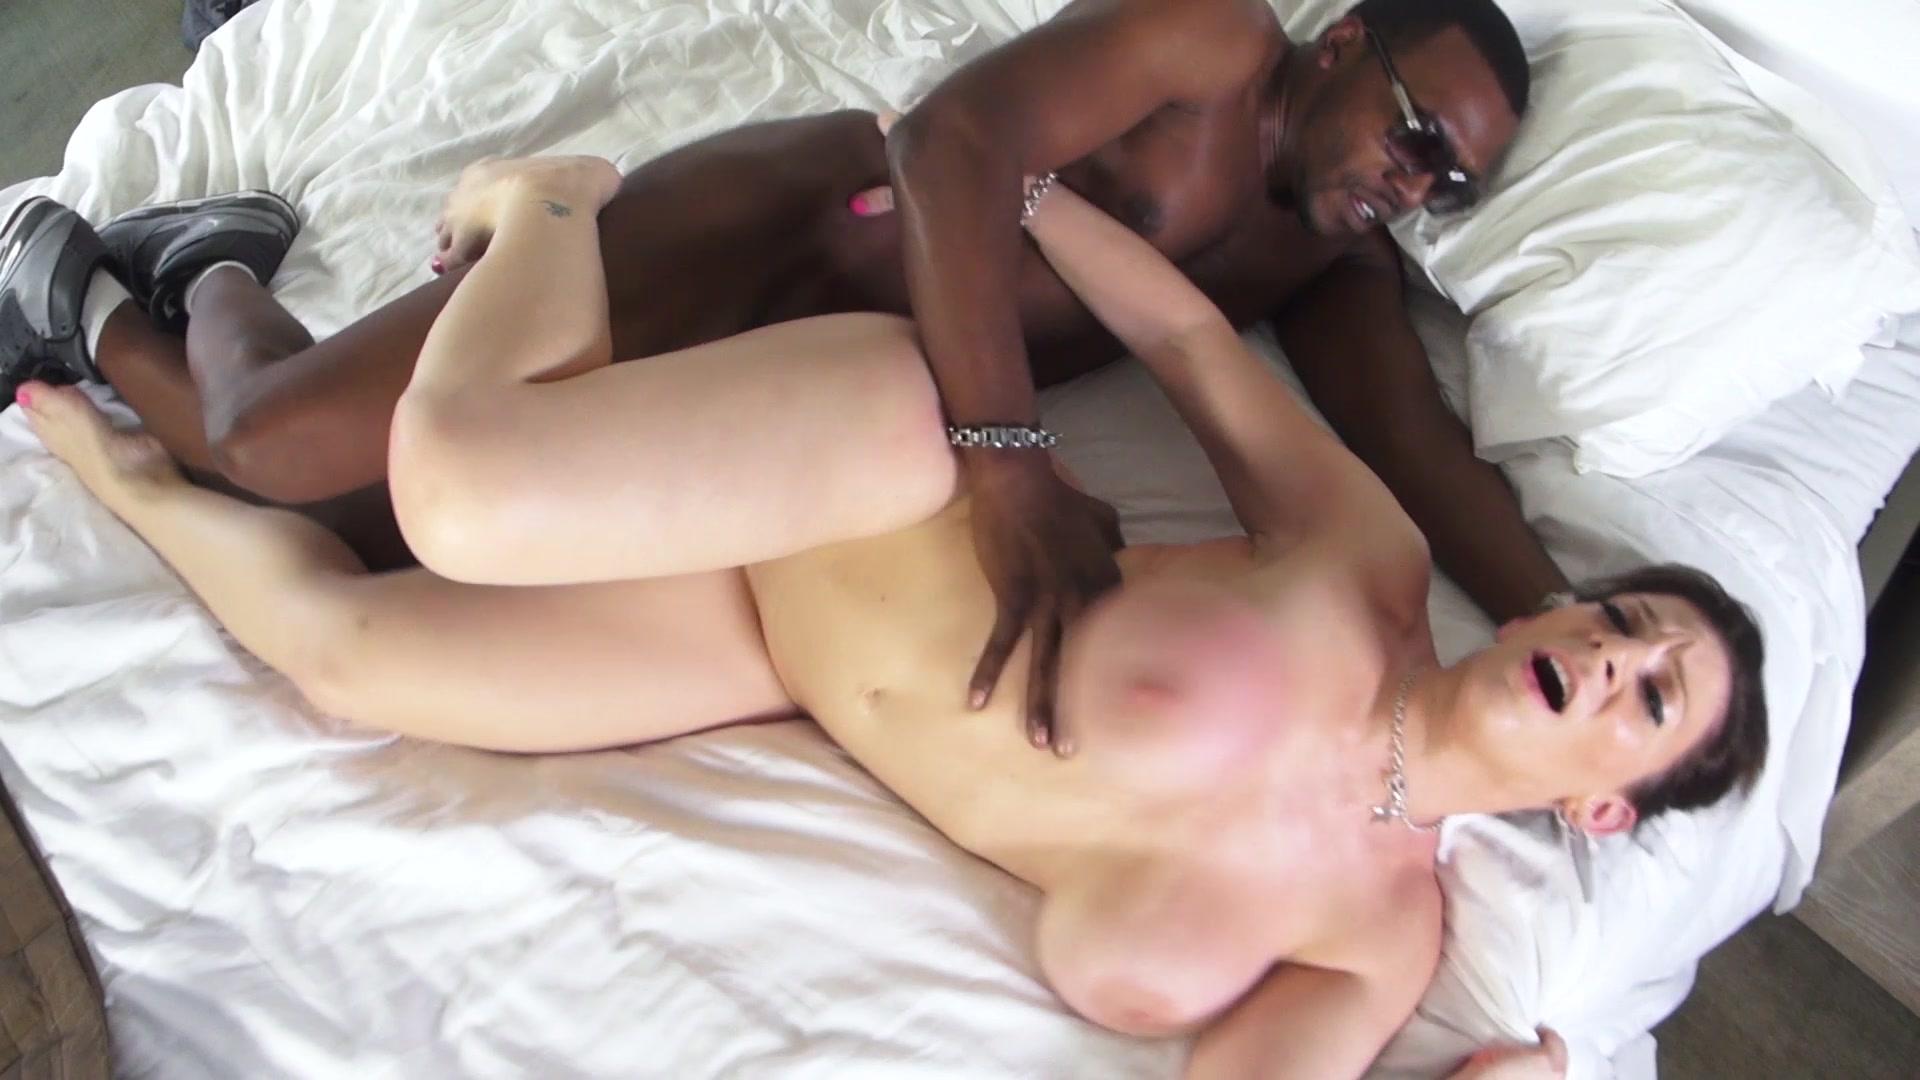 Sara jay sex pics free porn images